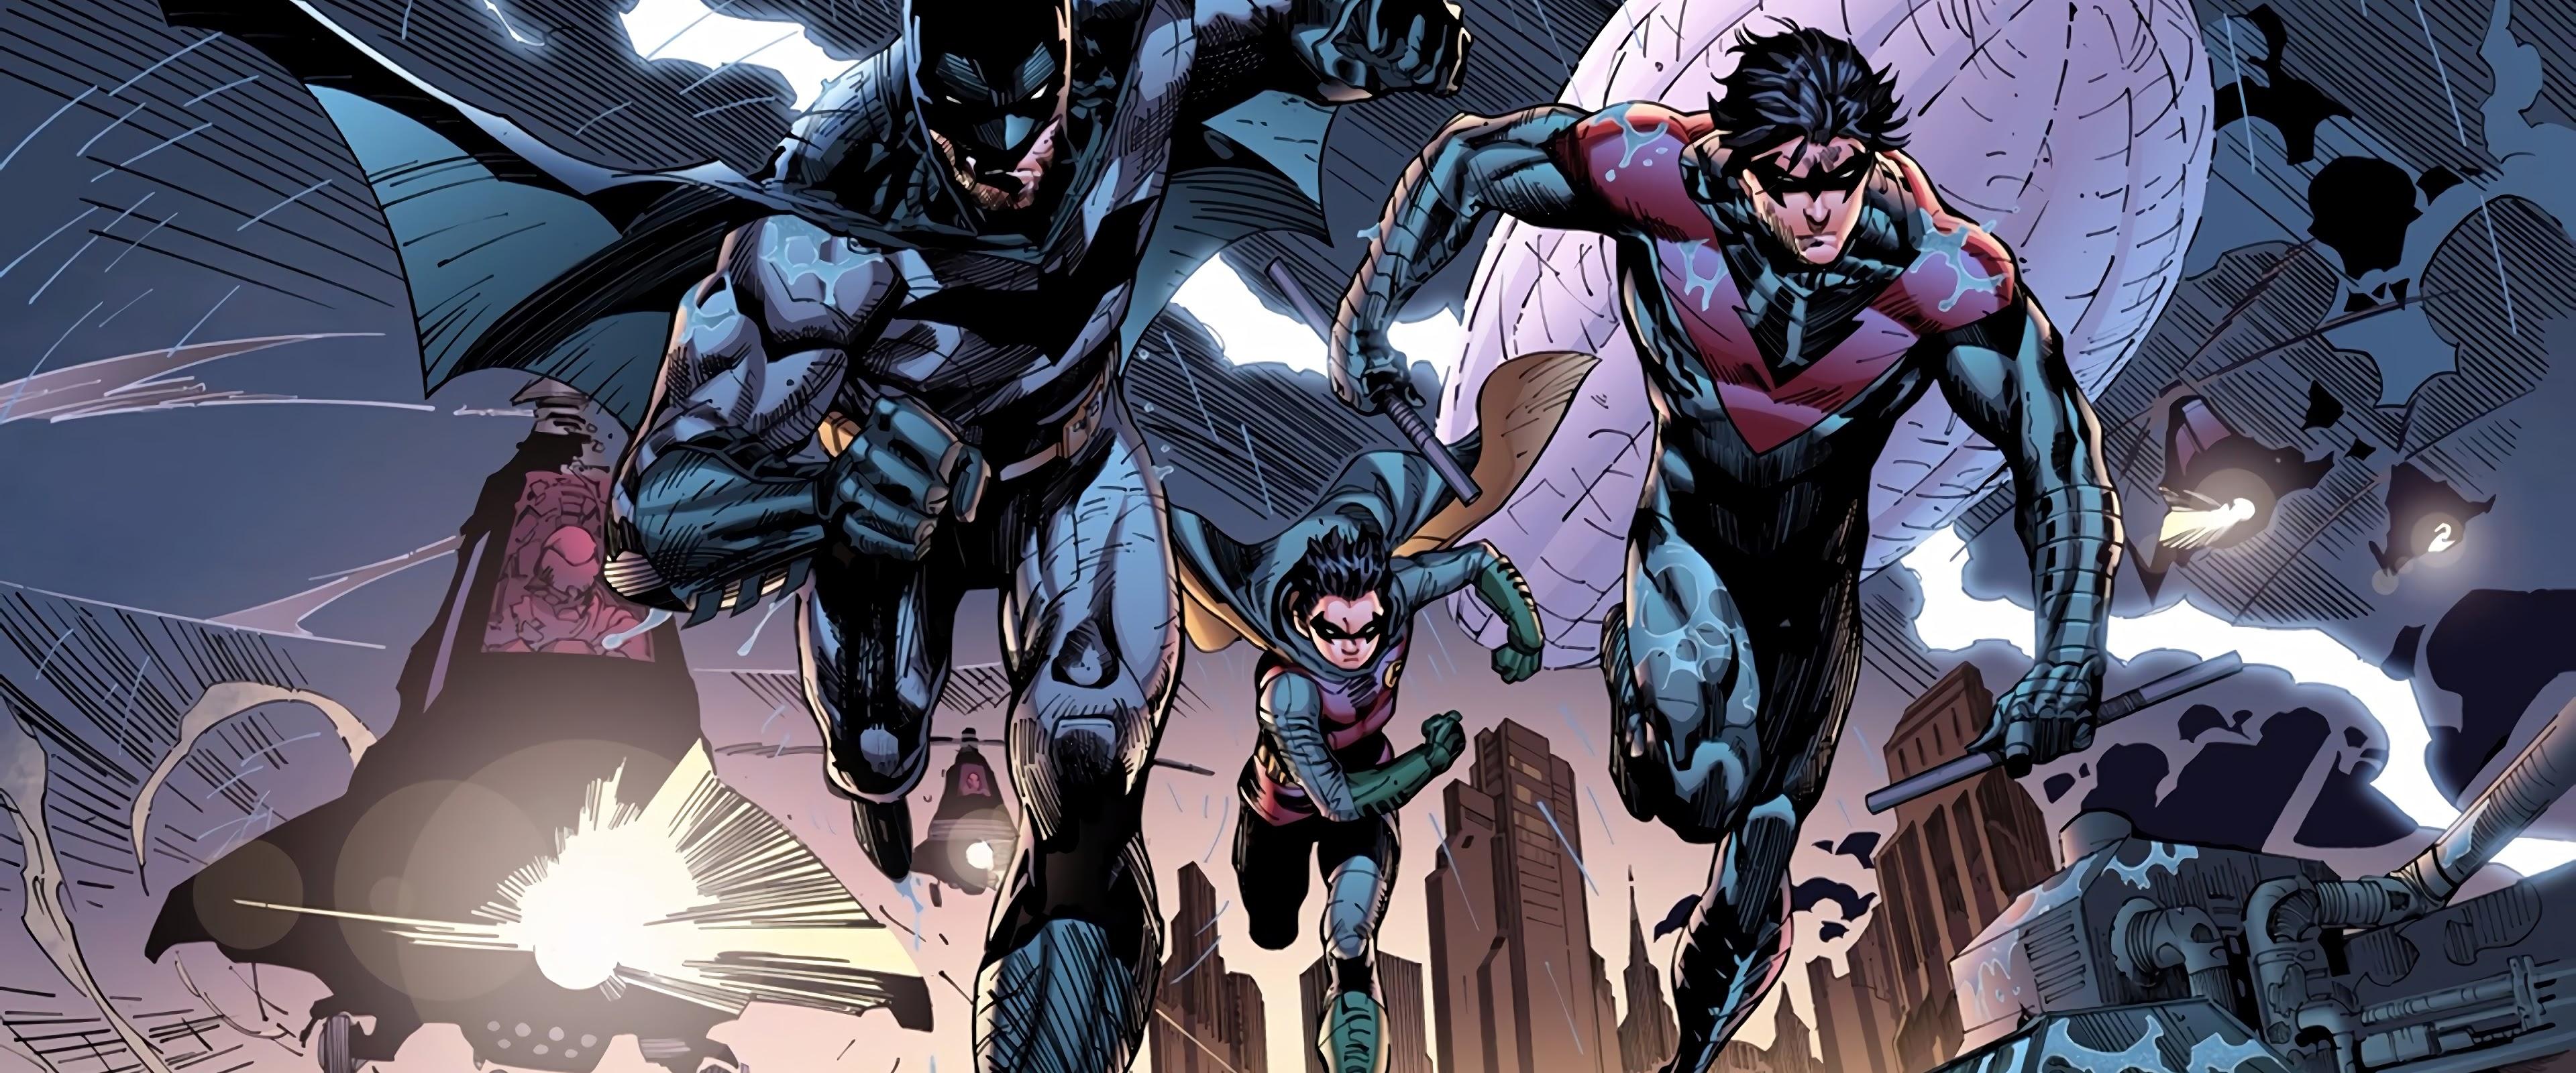 Batman Nightwing Robin 4k Wallpaper 21